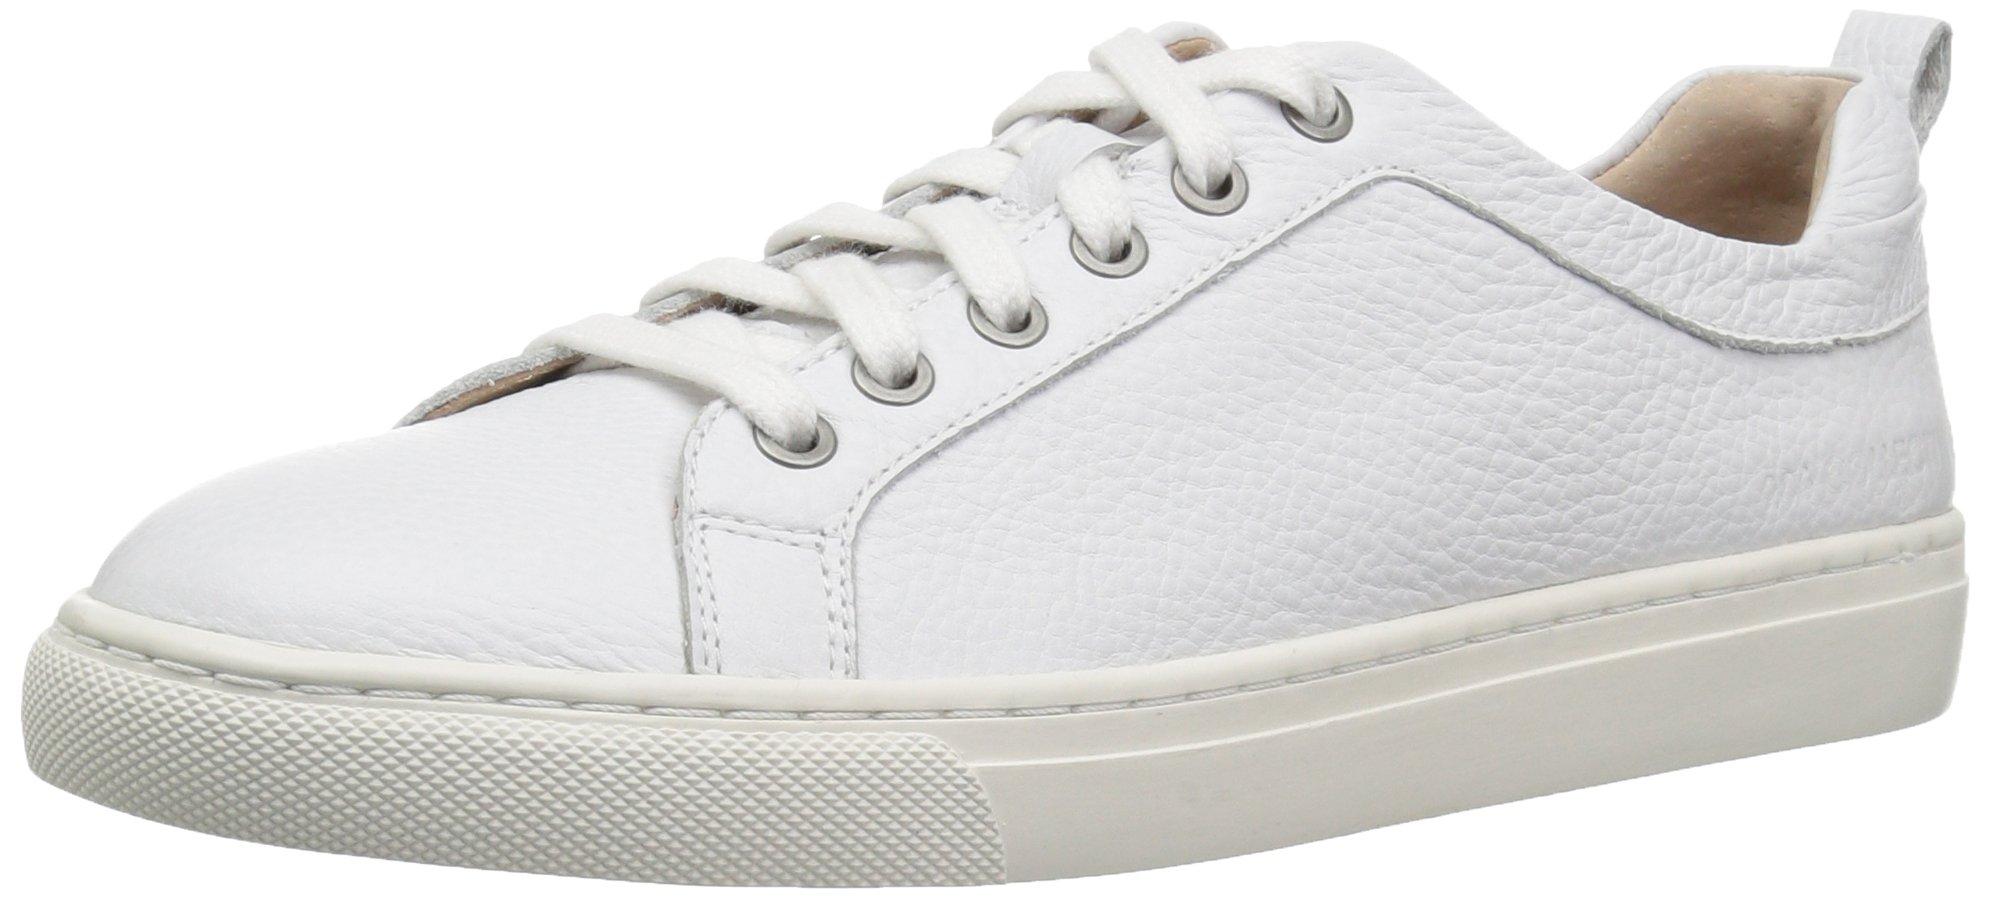 206 Collective Women's Lemolo Lace-up Fashion Sneaker, White Leather, 11 B US